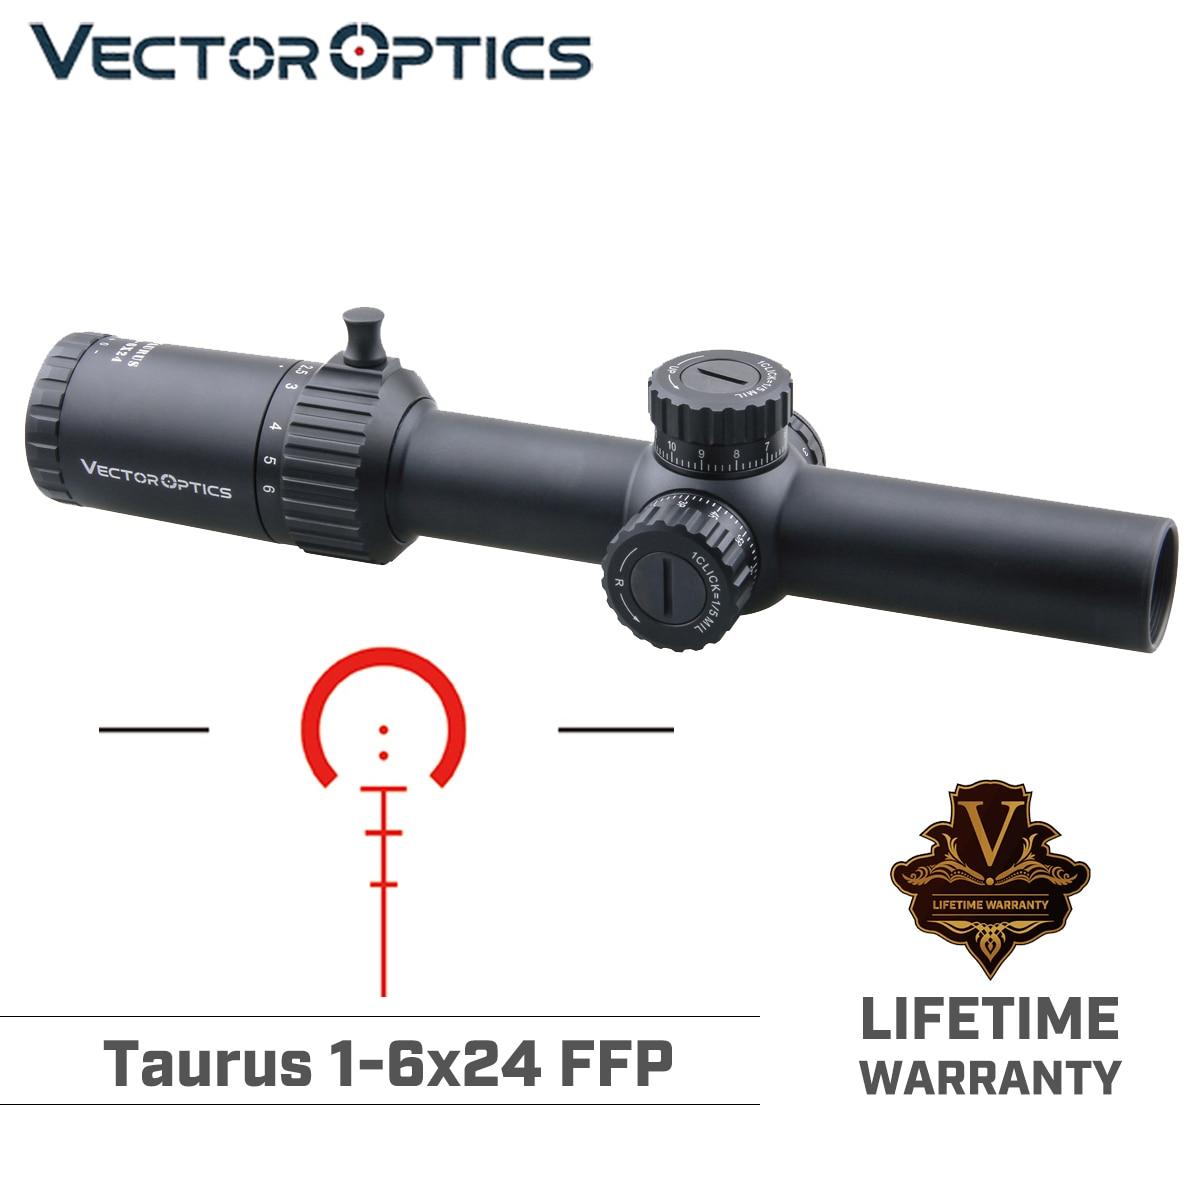 Vector Optics Taurus 1-6x24 FFP Hunting Riflescope Tactical Optical Scope 1/5 MIL 6 Levels Red BDC For CQB AR .223 .308win Dawn